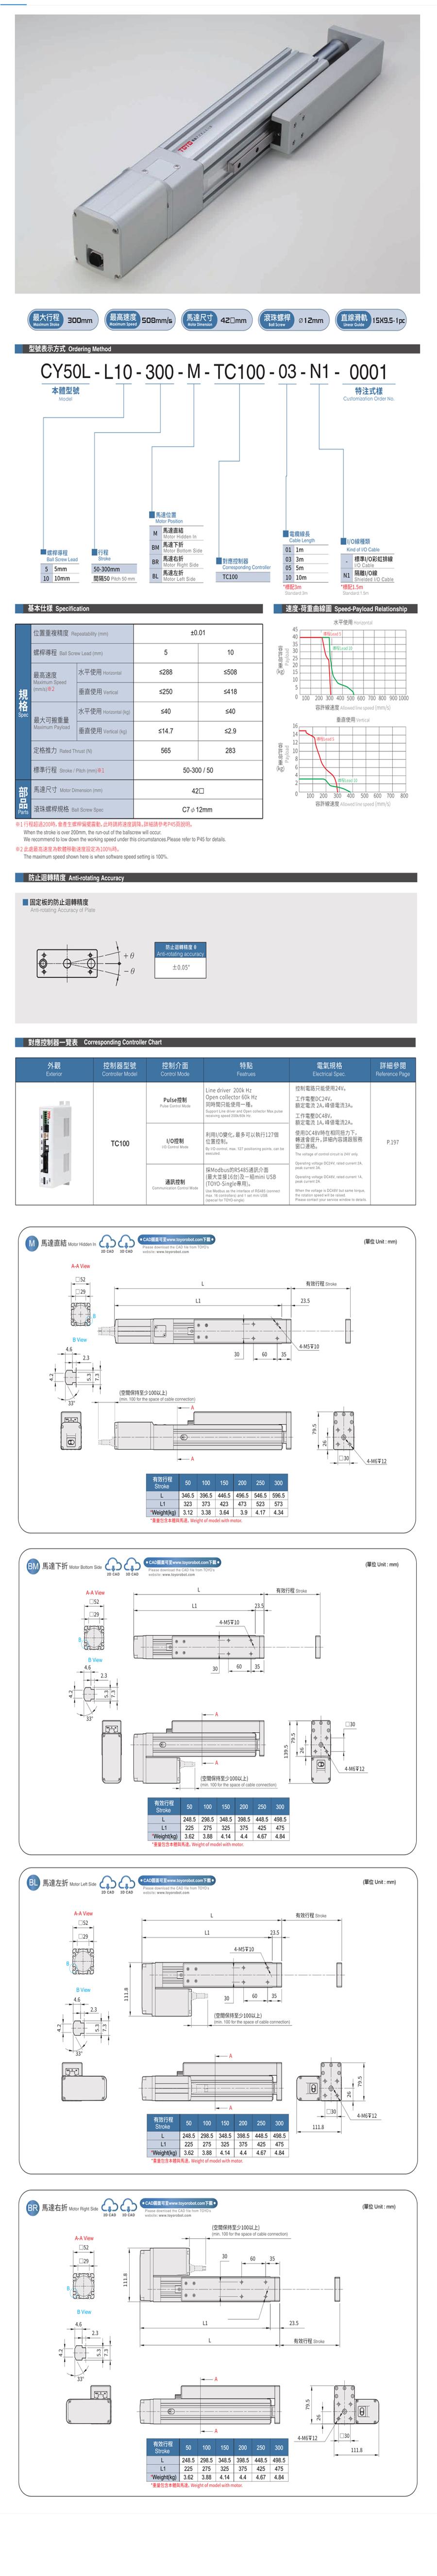 TOYO伺服电动缸CY50L